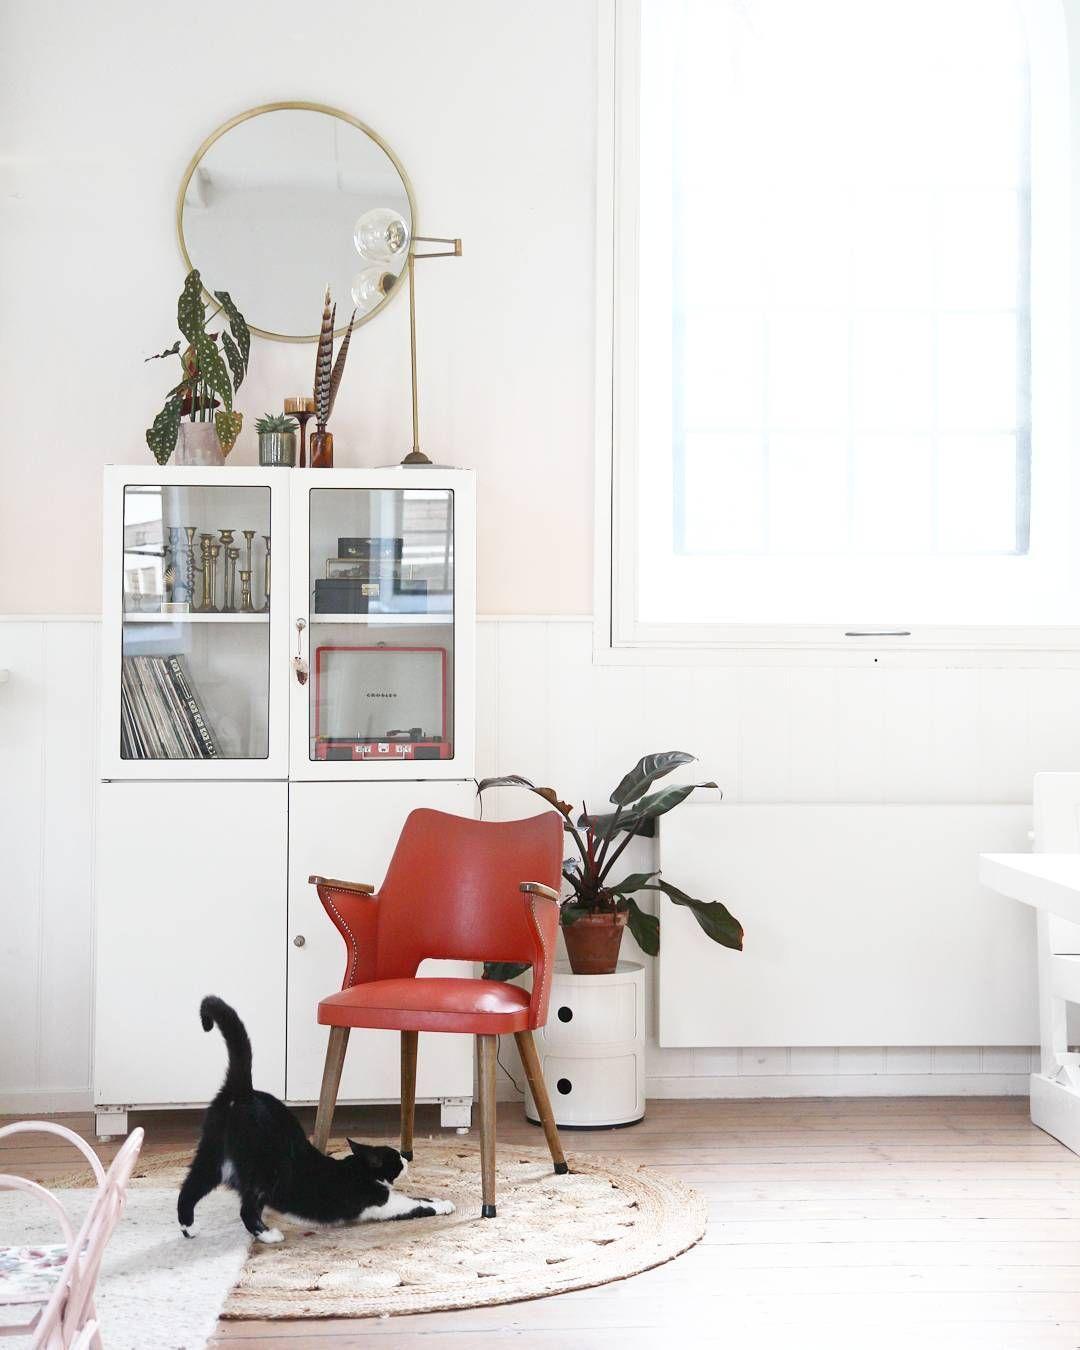 Home design bilder interieur fleursdamelie instagram  s  h  living room  pinterest  living